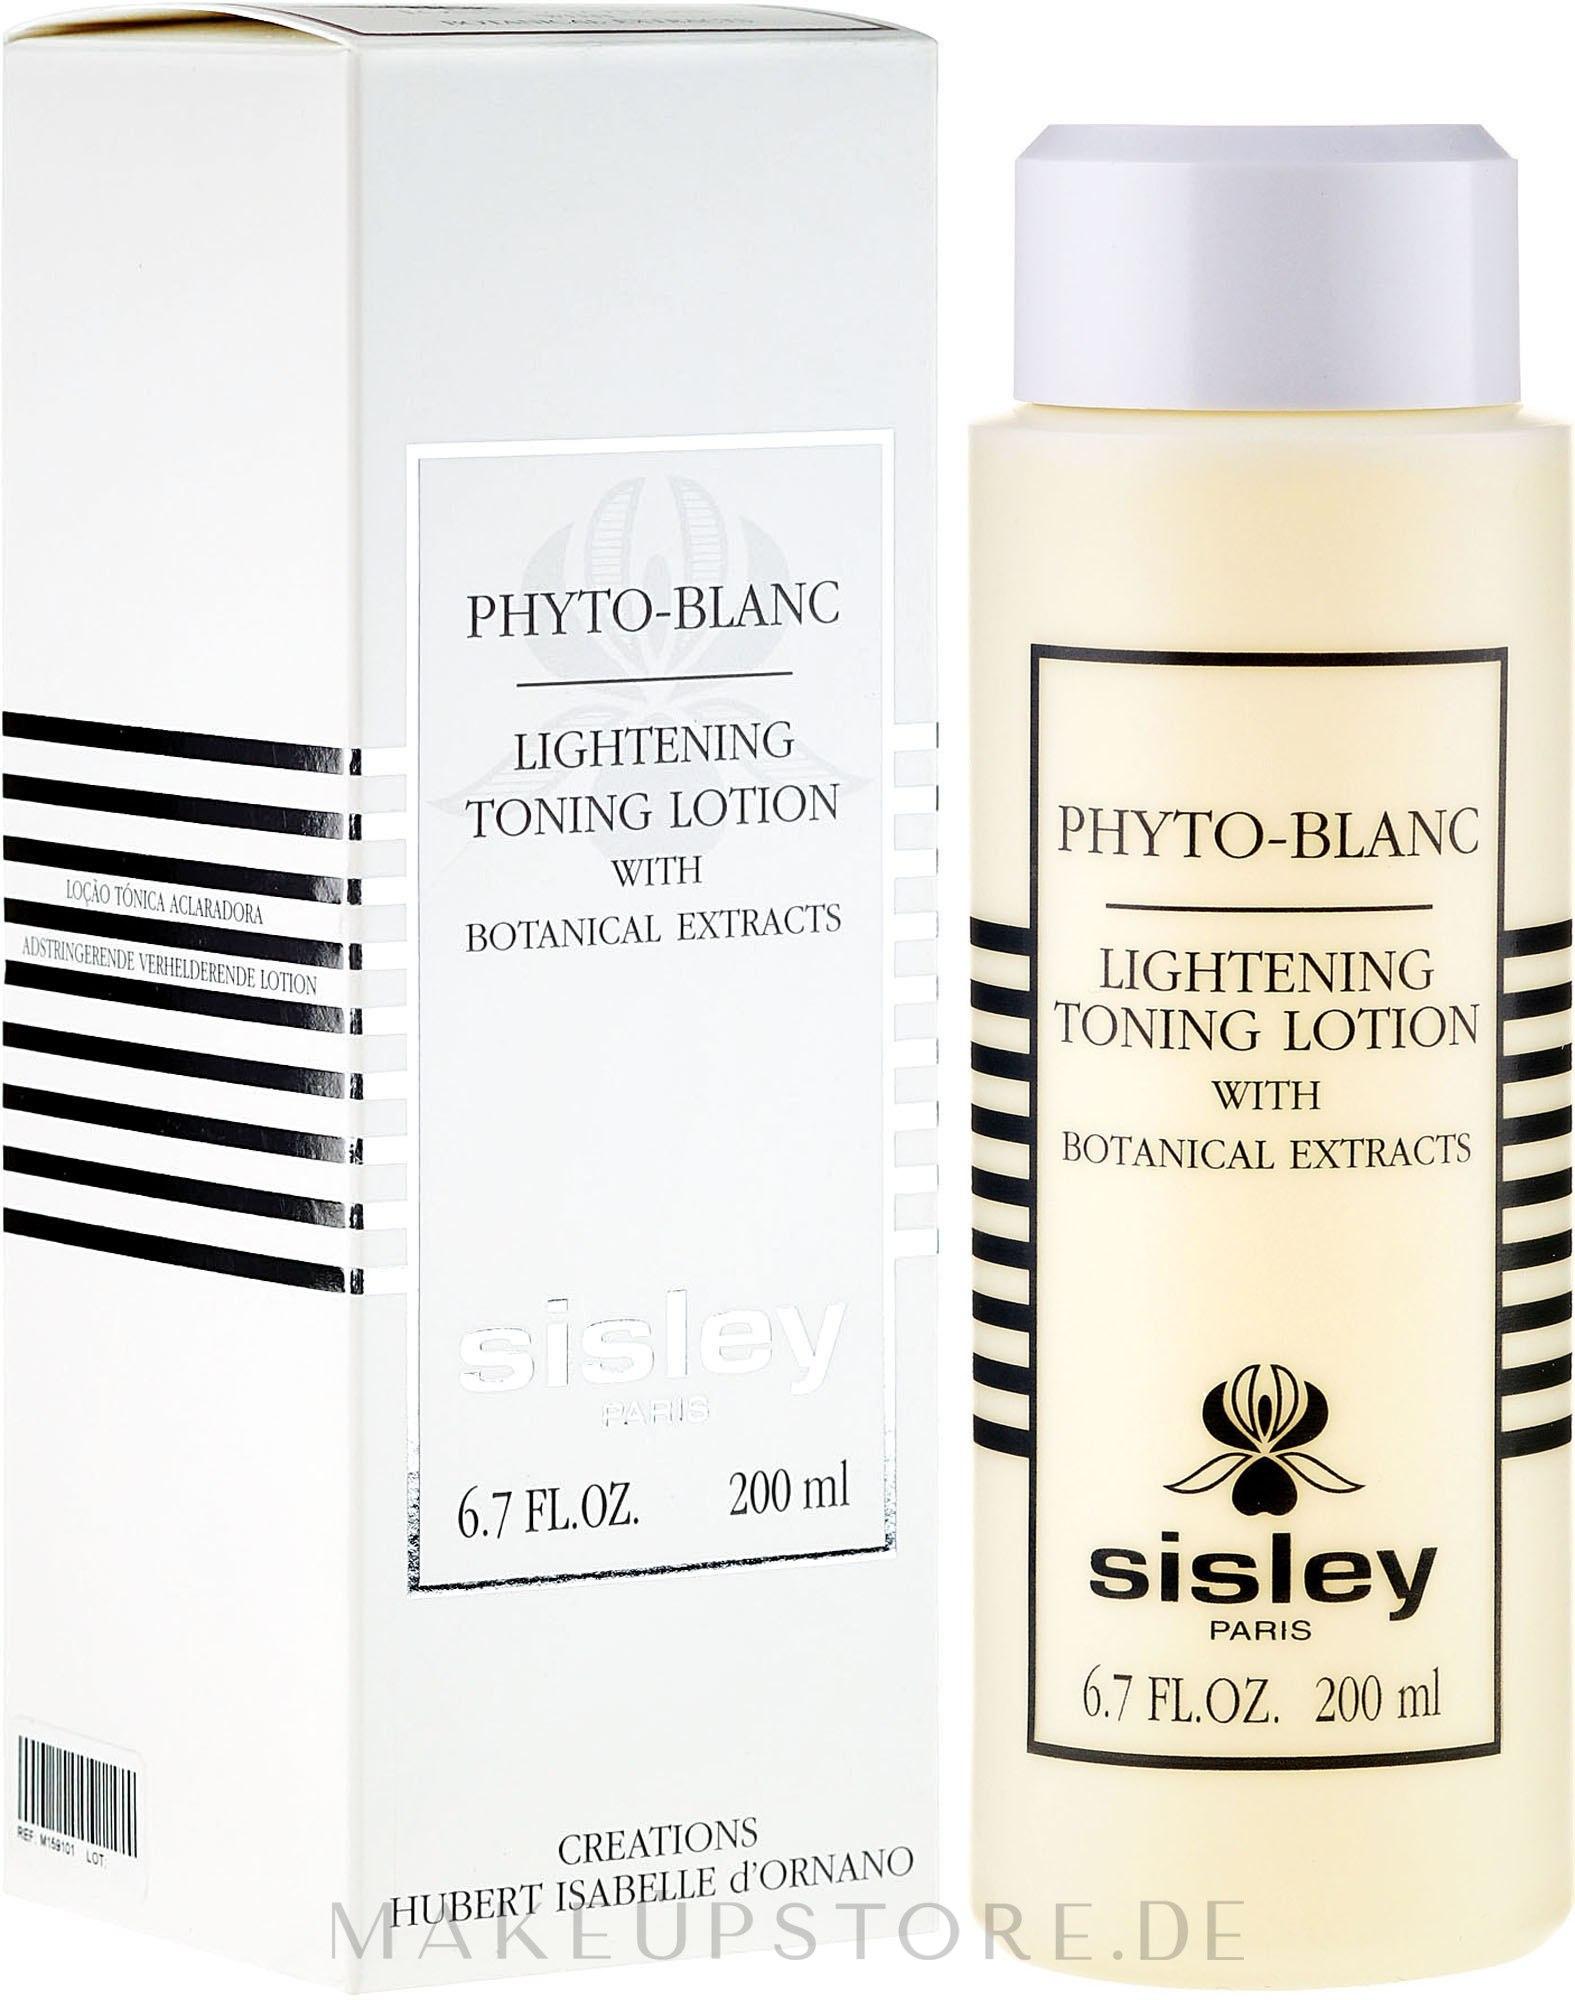 Gesichtslotion für Make-up-Entfernung mit Pflanzenextrakten - Sisley Phyto-Blanc Lightening Toning Lotion — Bild 200 ml